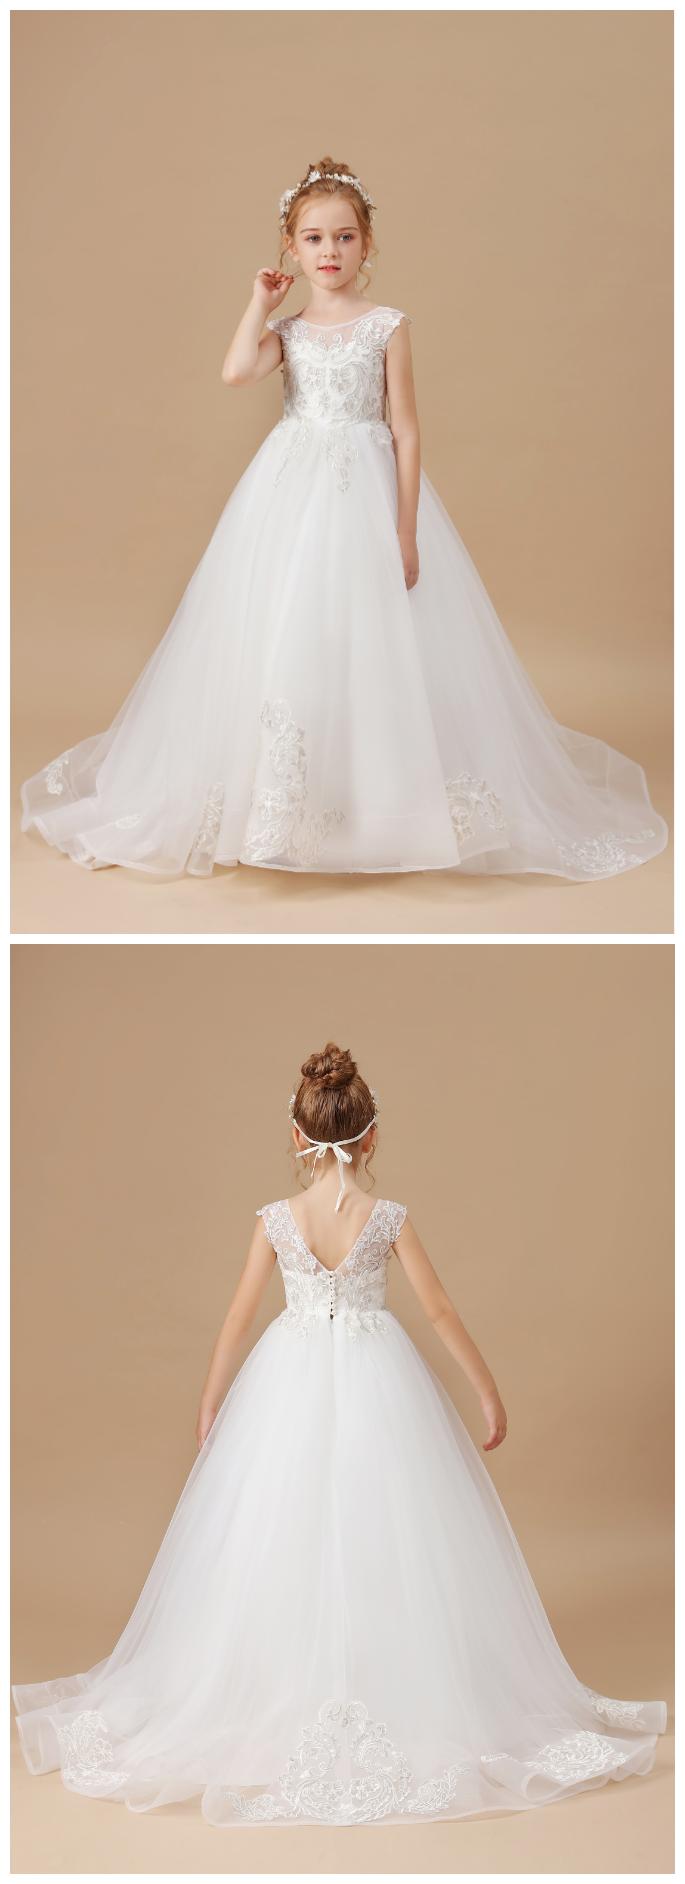 Flower Girl Dresses,Elegant Flower Girls Dress Wedding Party Princess Dress Kids